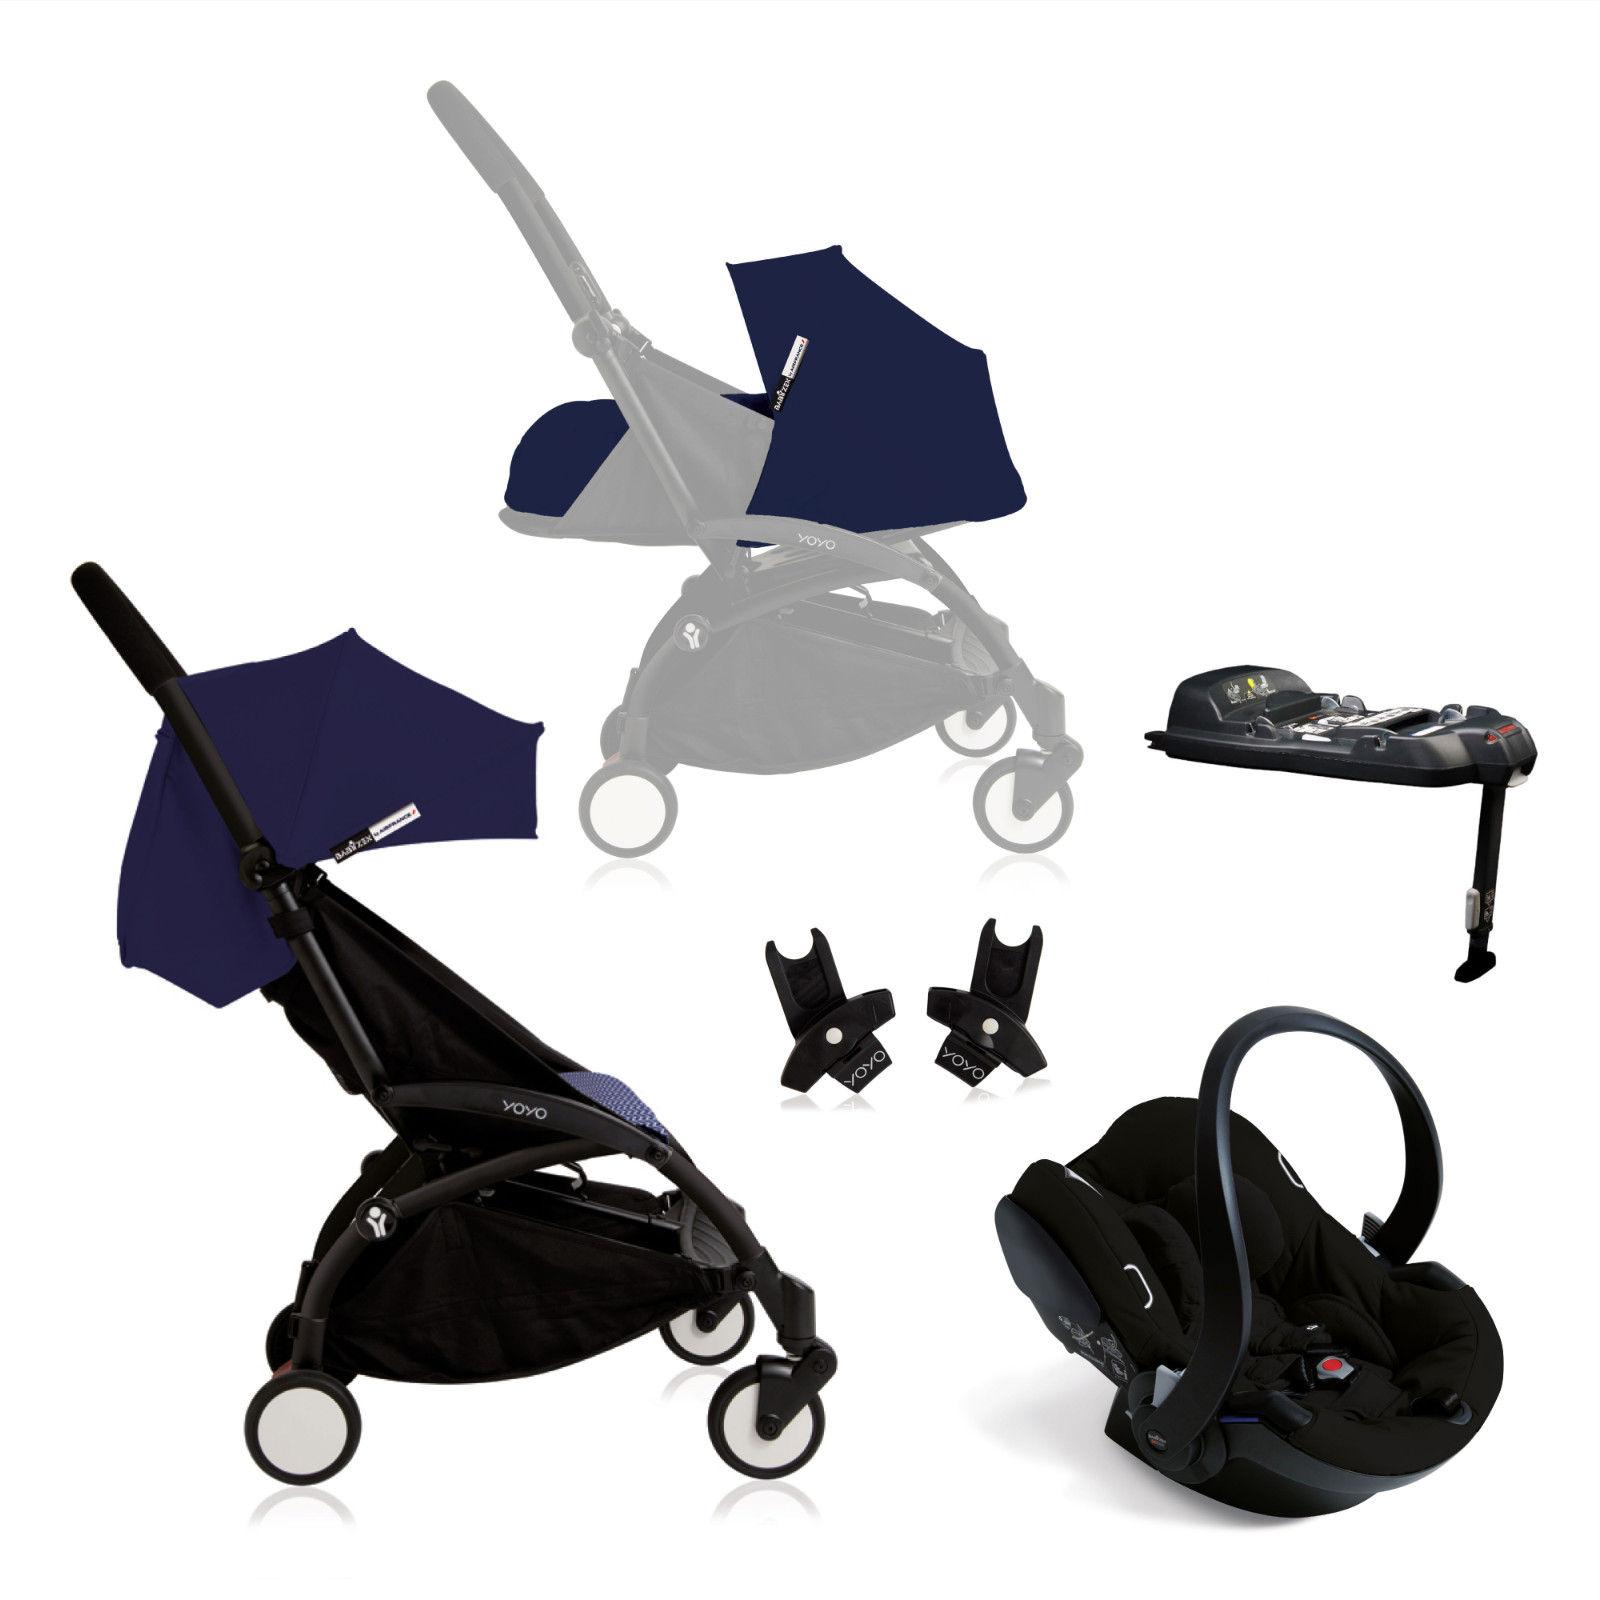 Babyzen Yoyo+ (Black Chassis) Newborn Travel System - Air France ...